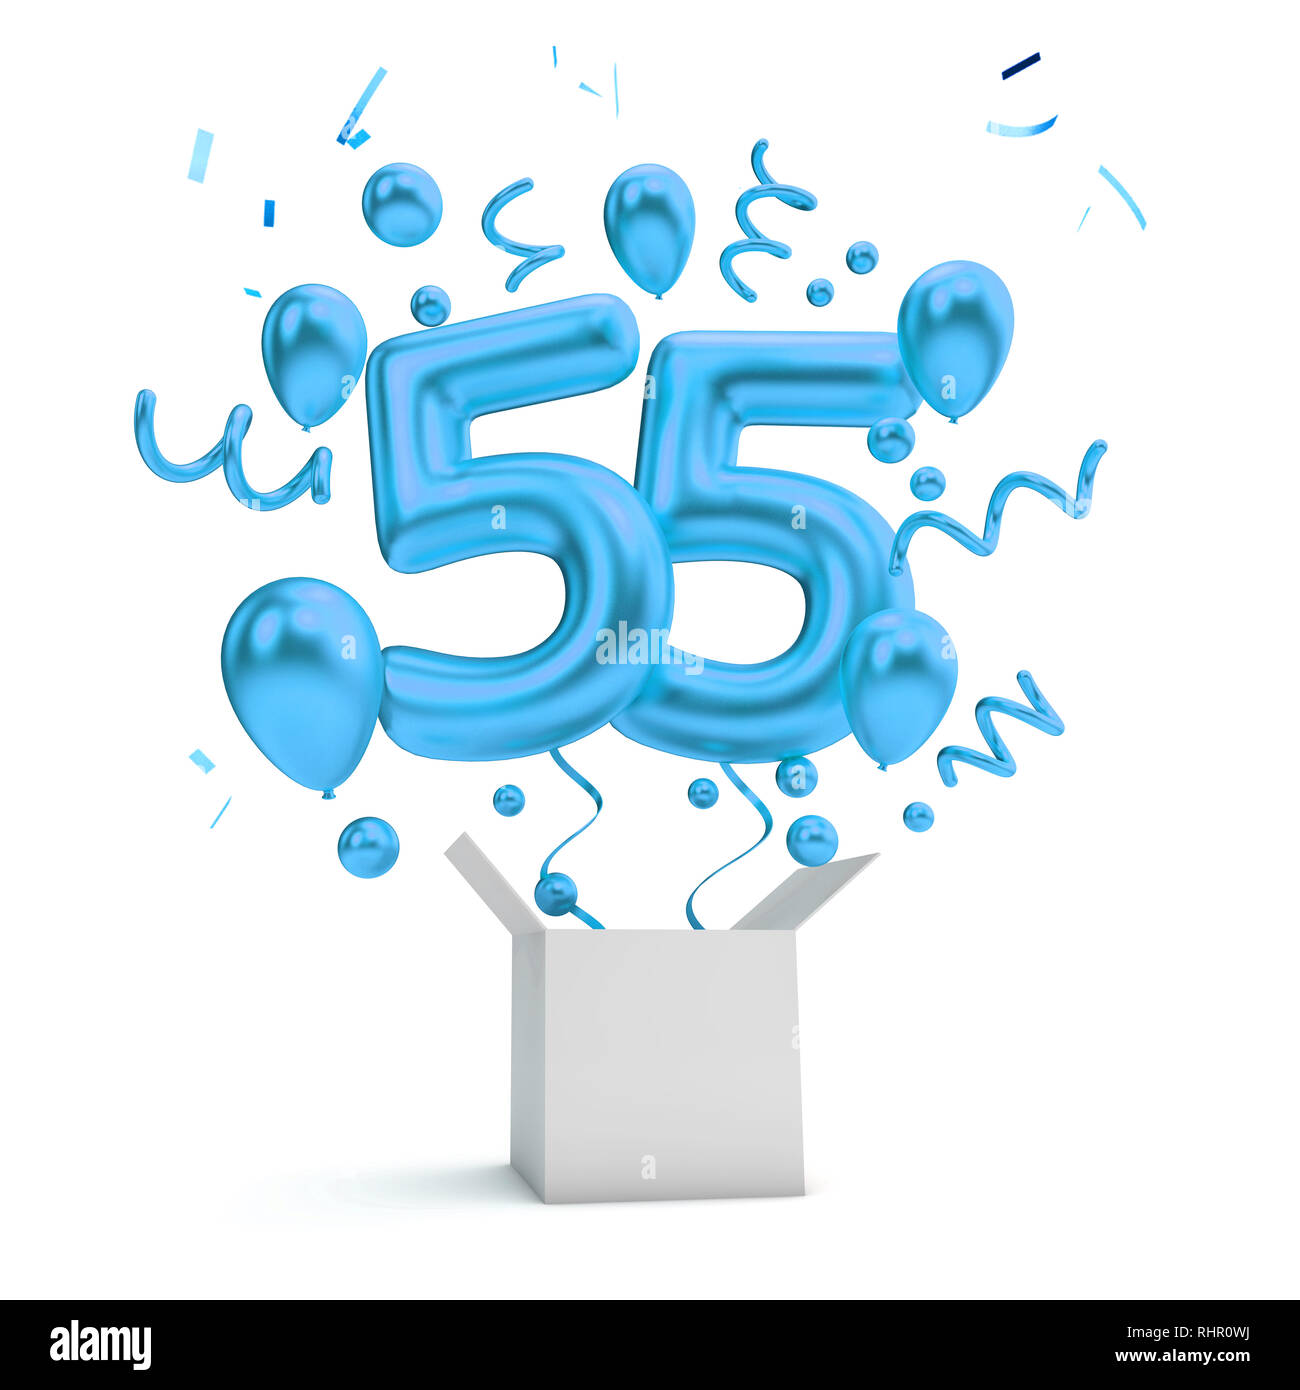 Happy 55th Birthday Blau Uberraschung Ballon Und Box 3D Rendering